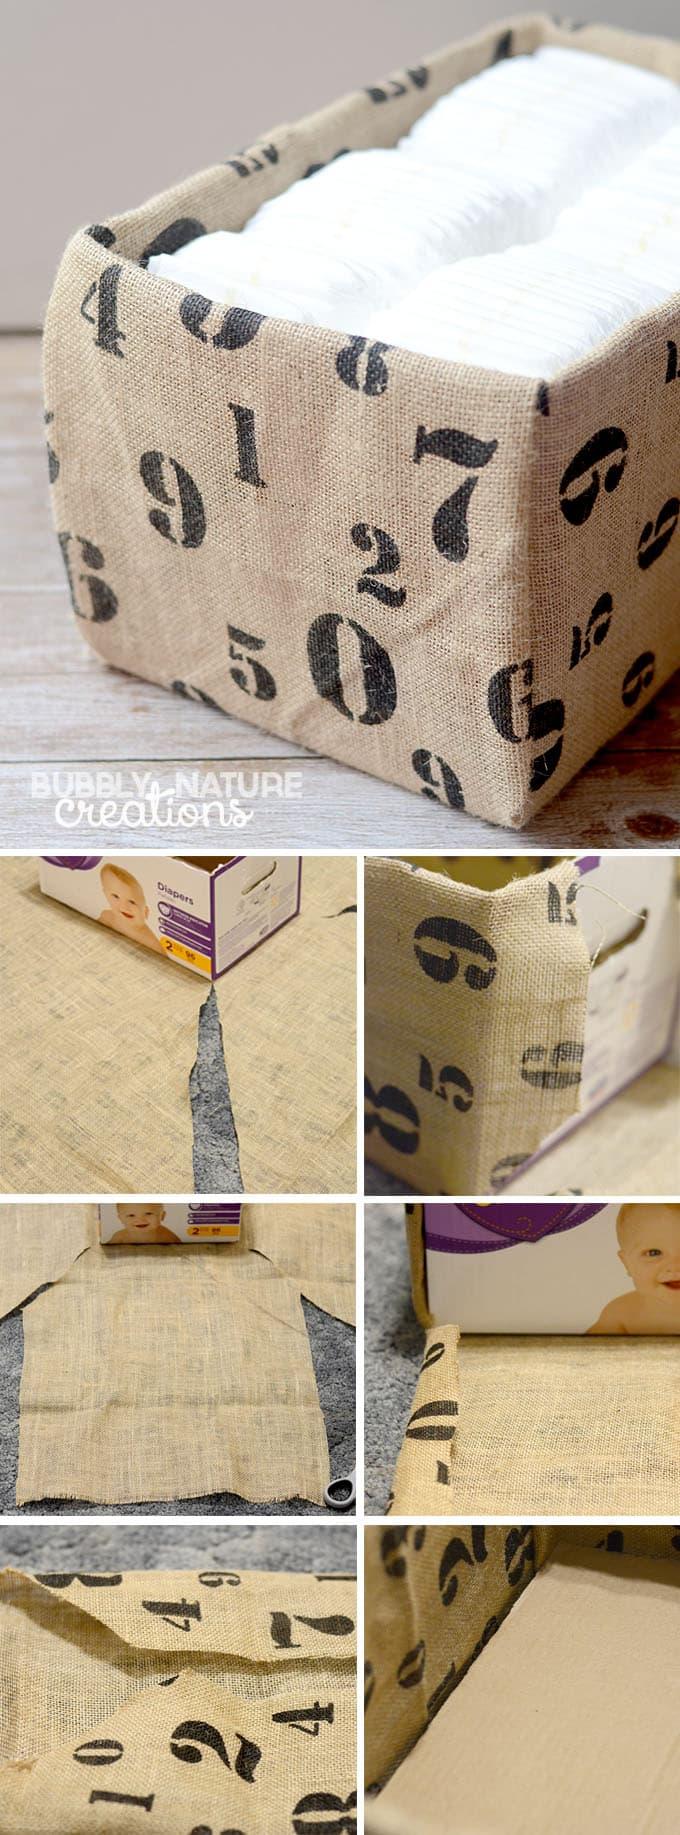 Fabric Covered Diaper Box Tutorial